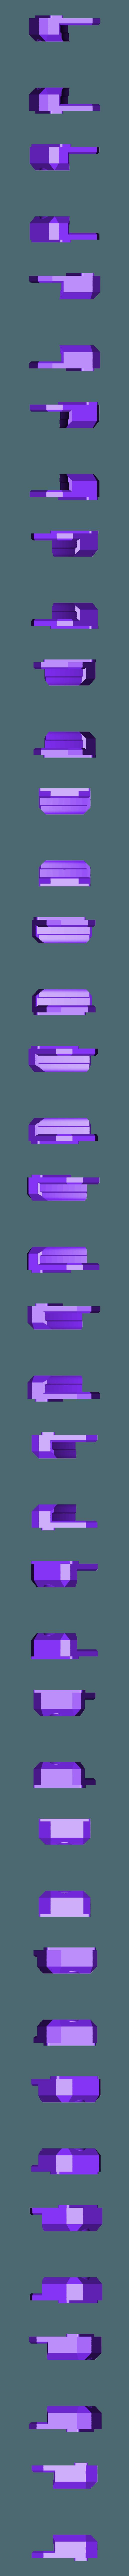 Ultrabase_Clip.stl Download free STL file Anycubic Kossel Linear Plus Ultrabase heatbed clips • 3D printer model, CartesianCreationsAU